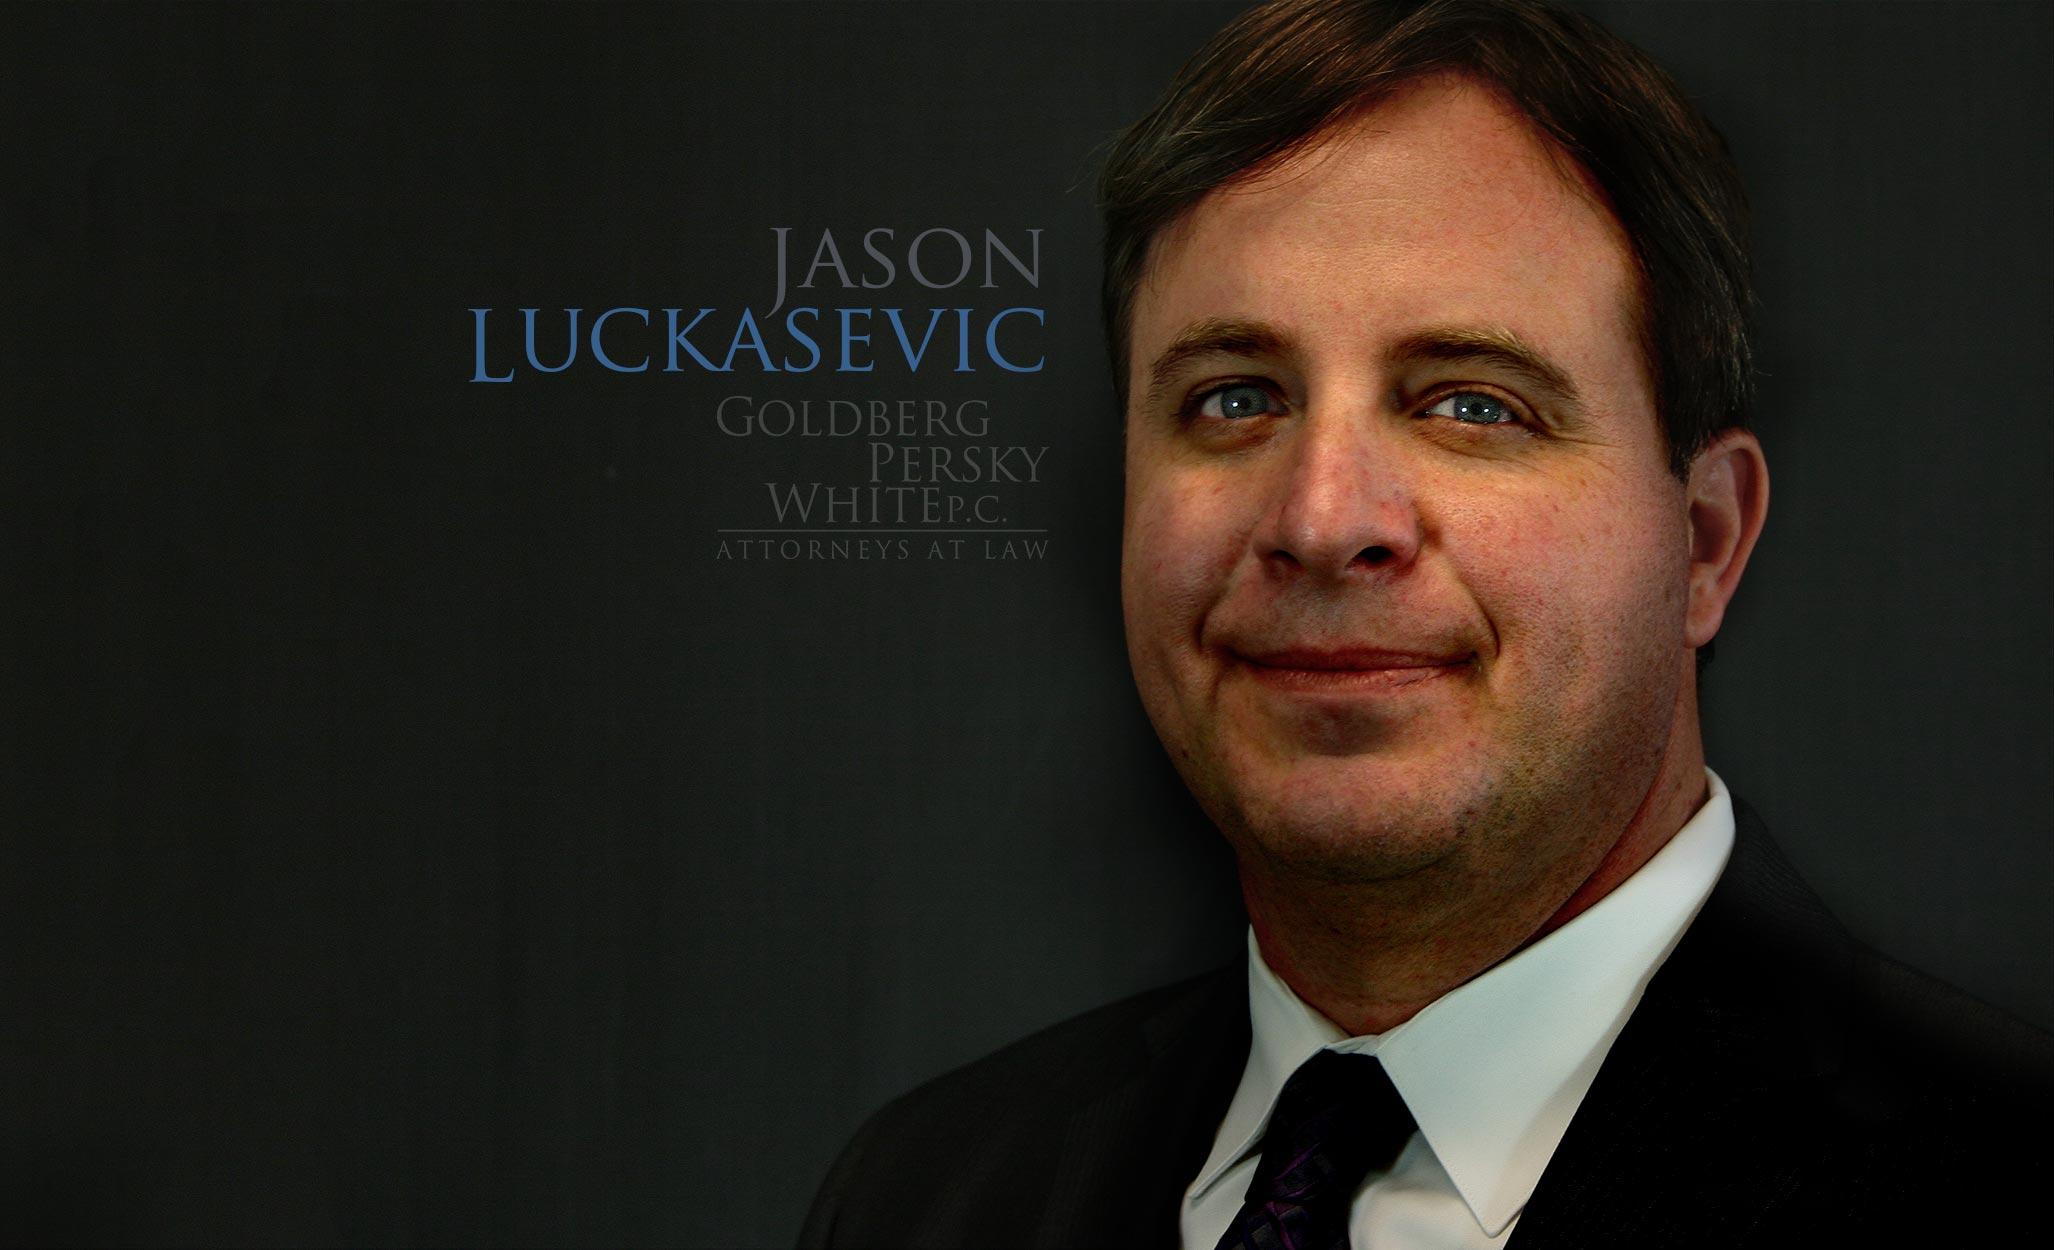 Jason Luckasevic, Attorney at Law.